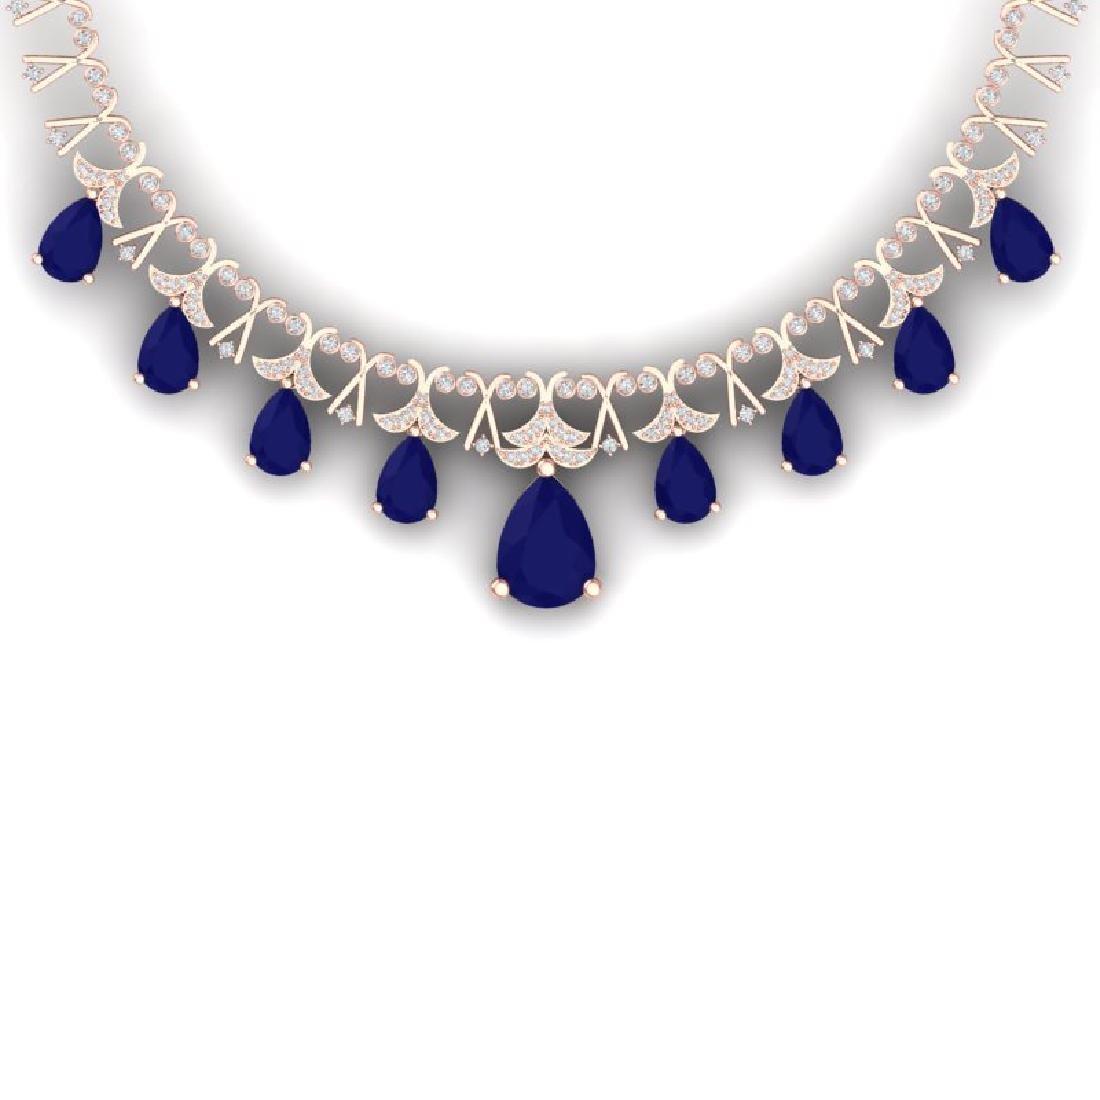 56.94 CTW Royalty Sapphire & VS Diamond Necklace 18K